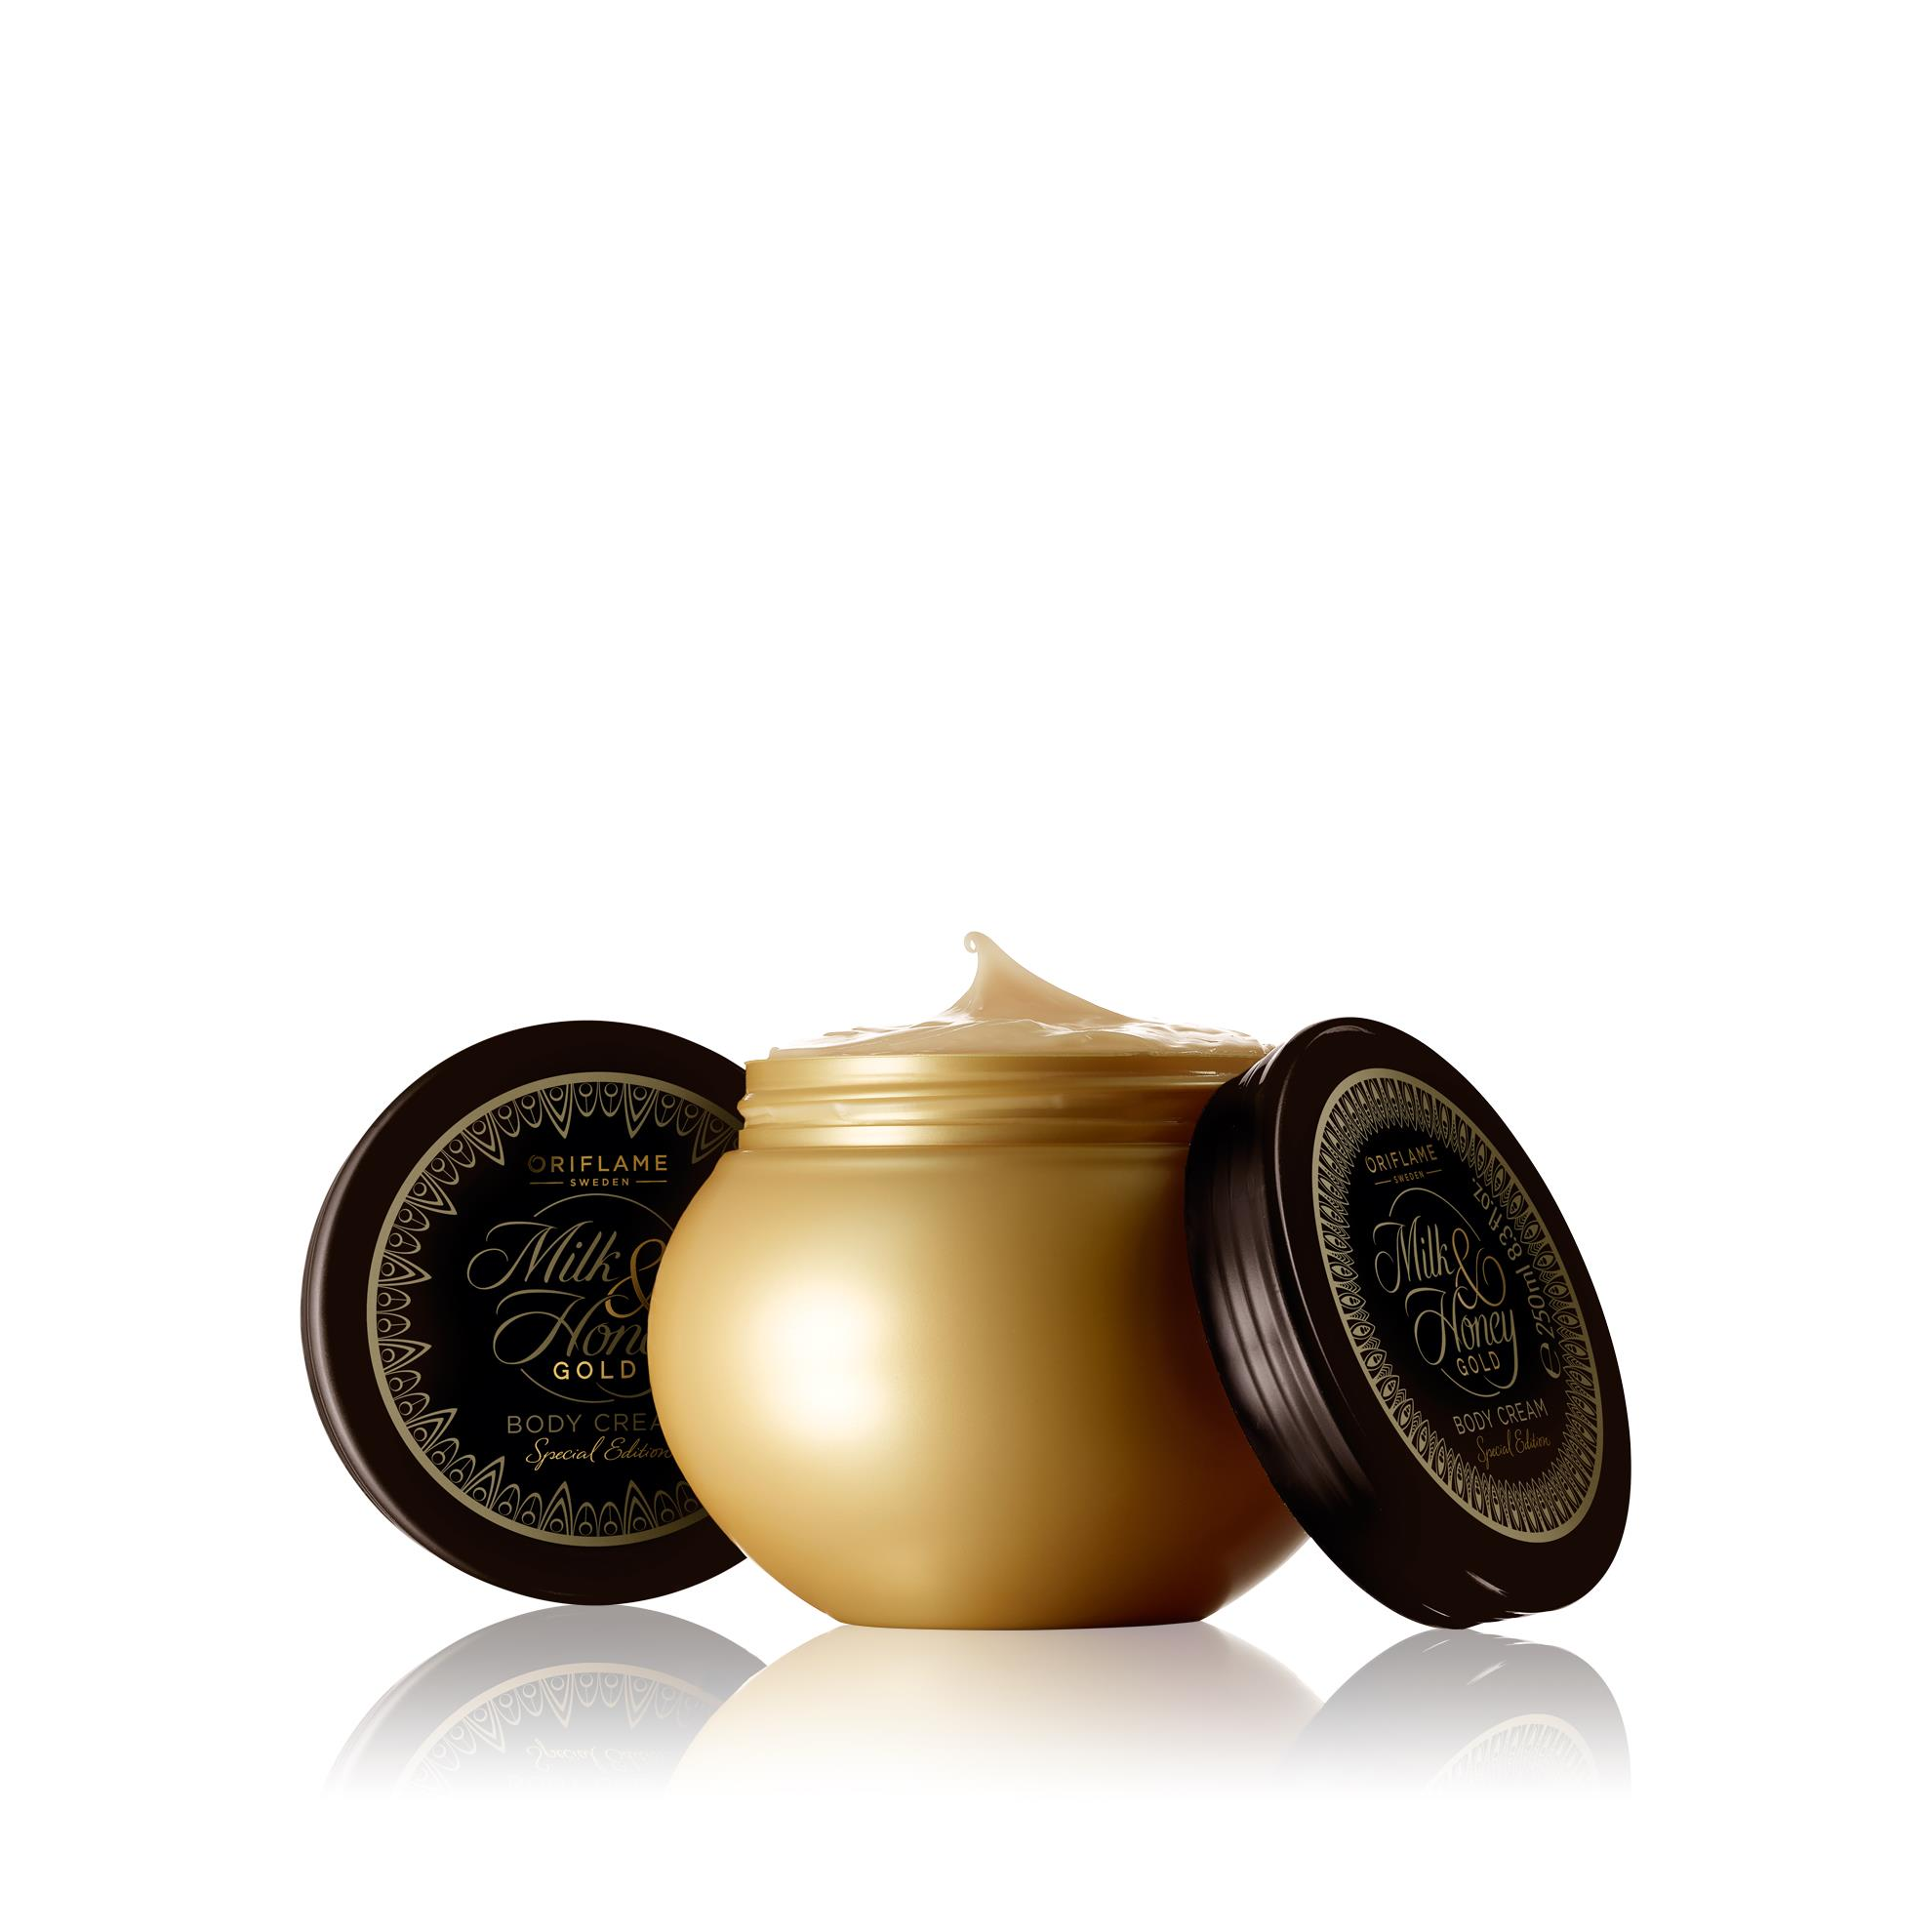 Oriflame krem do ciała Milk&Honey Gold 250 ml